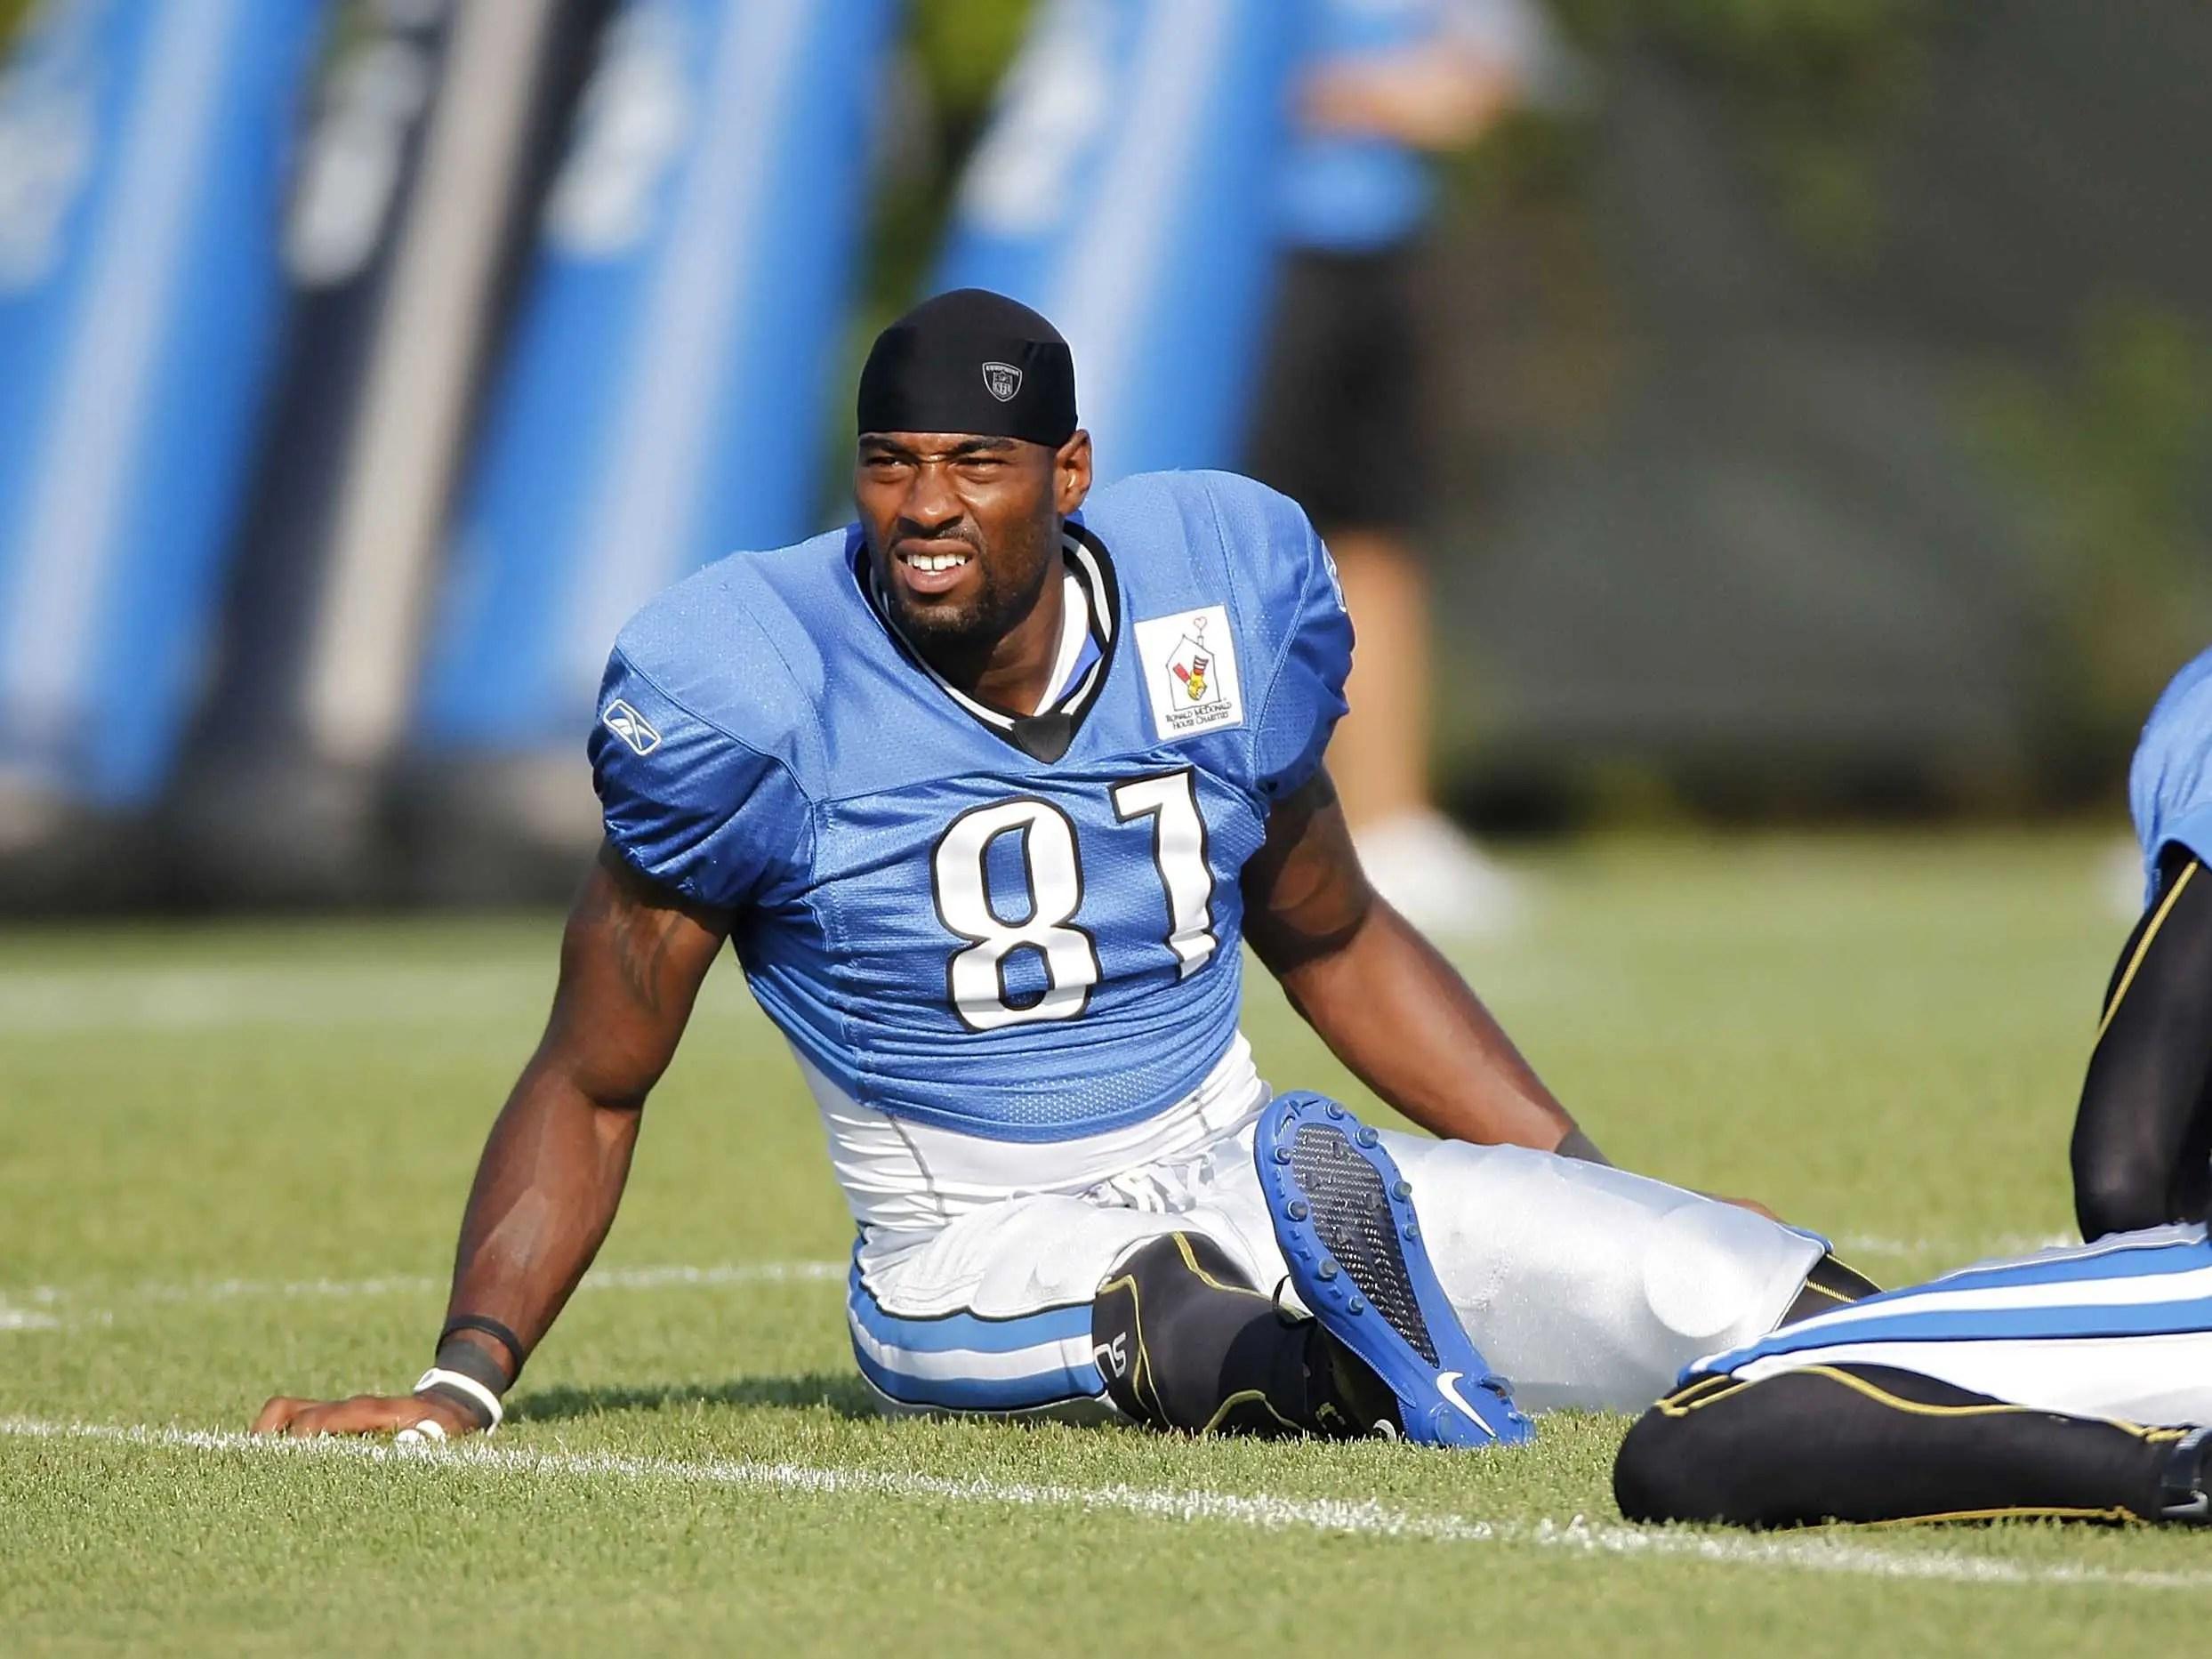 #20 Calvin Johnson